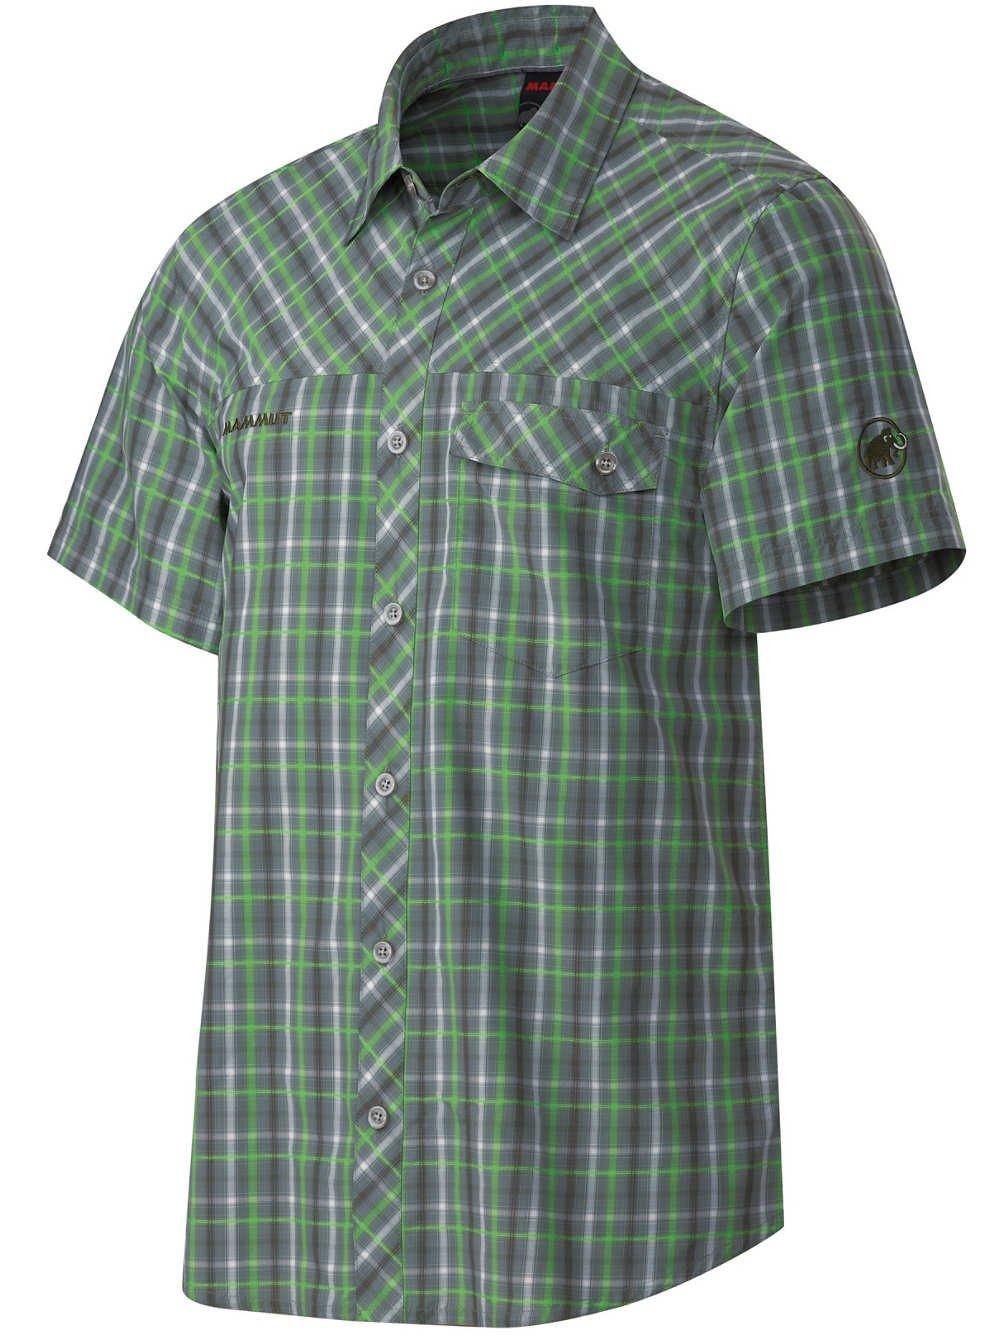 Mammut Herren Kurzarmhemd Asko Shirt